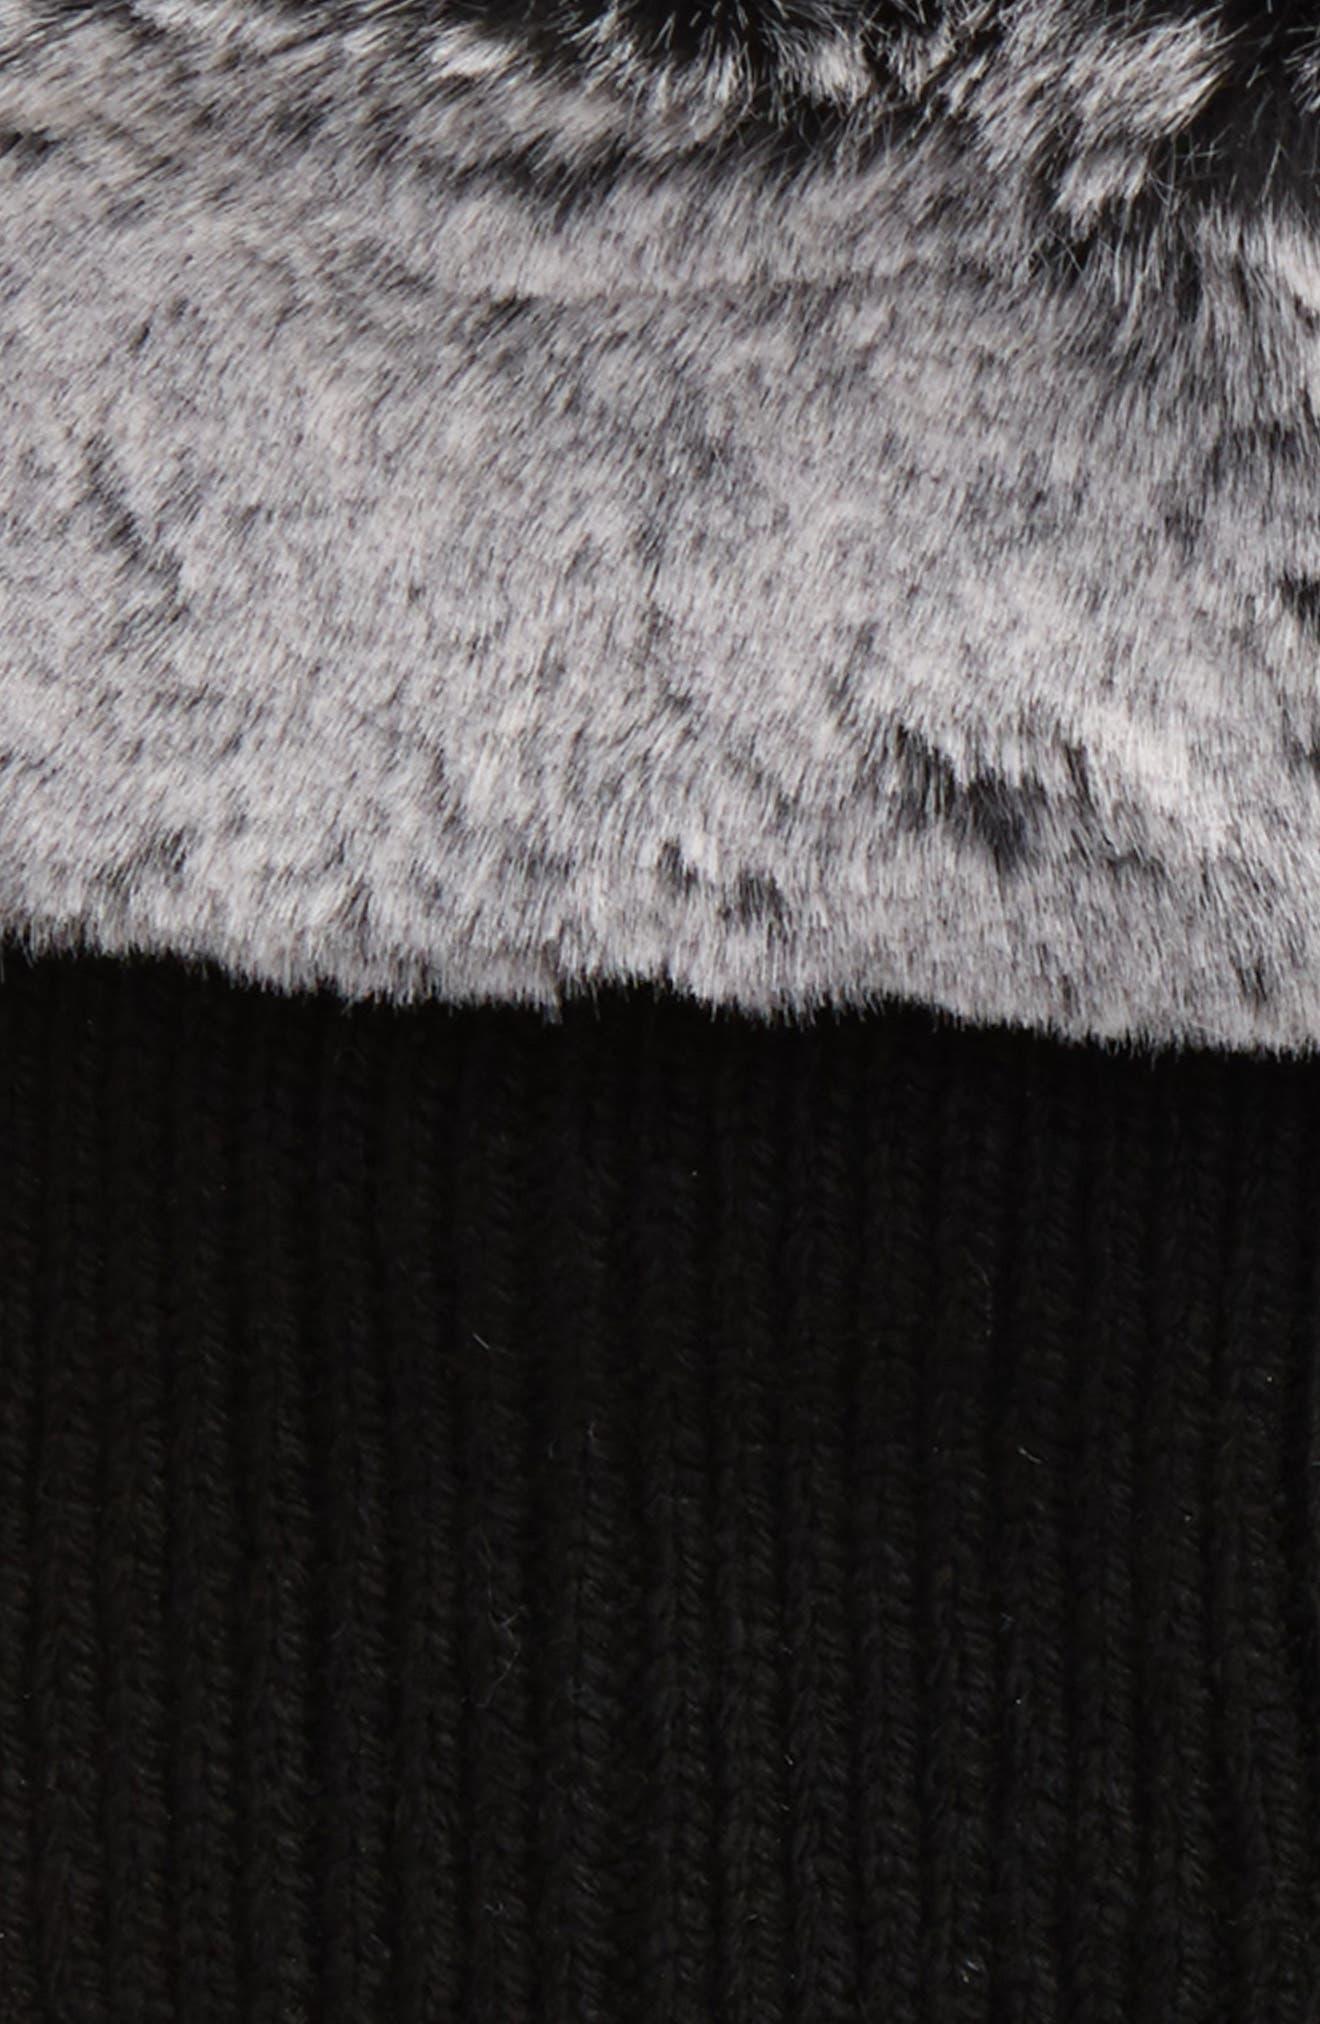 UGGpure<sup>™</sup> Tall Rain Boot Sock,                             Alternate thumbnail 2, color,                             Charcoal Wool